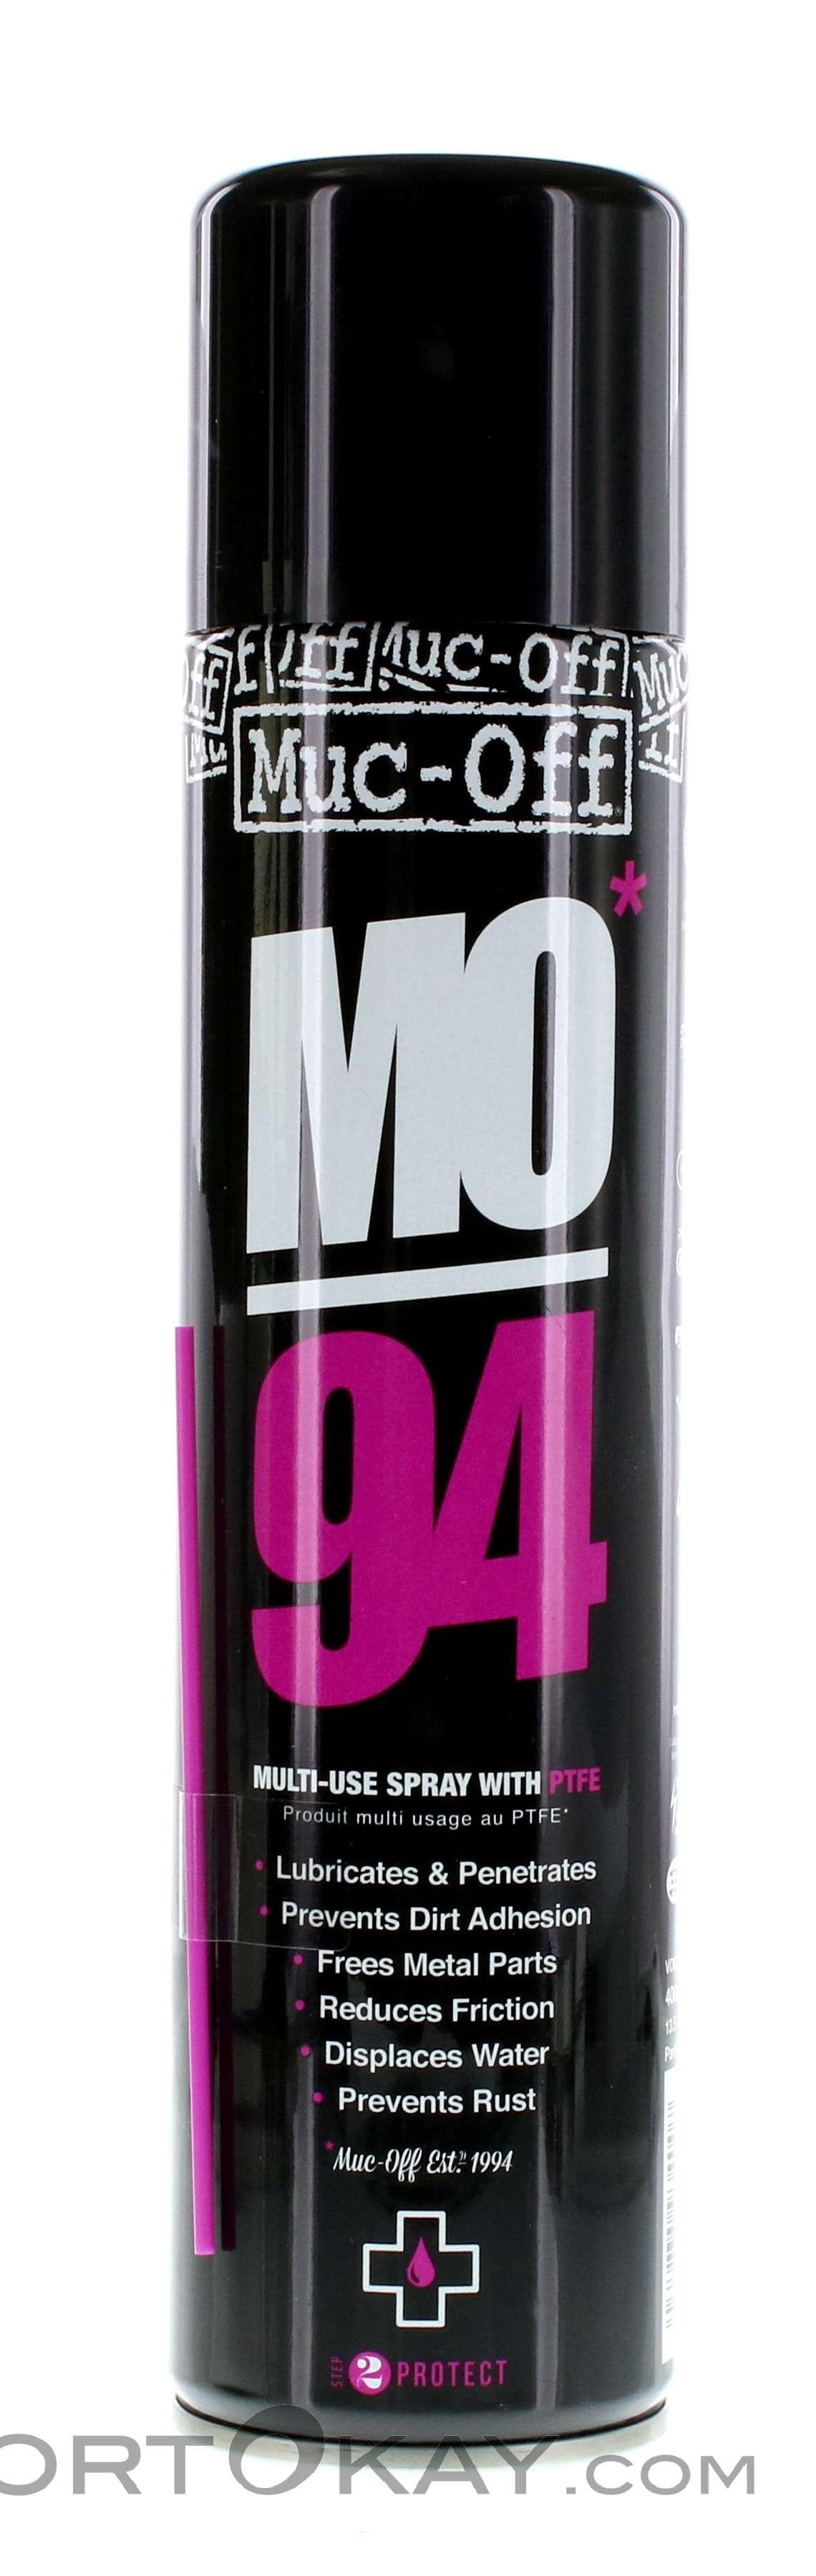 Muck Off Mo-94 Multi Use Spray Universalspray, Muc Off, Pink-Rosa, , Unisex, 0172-10020, 5637485913, 5037835934007, N1-01.jpg